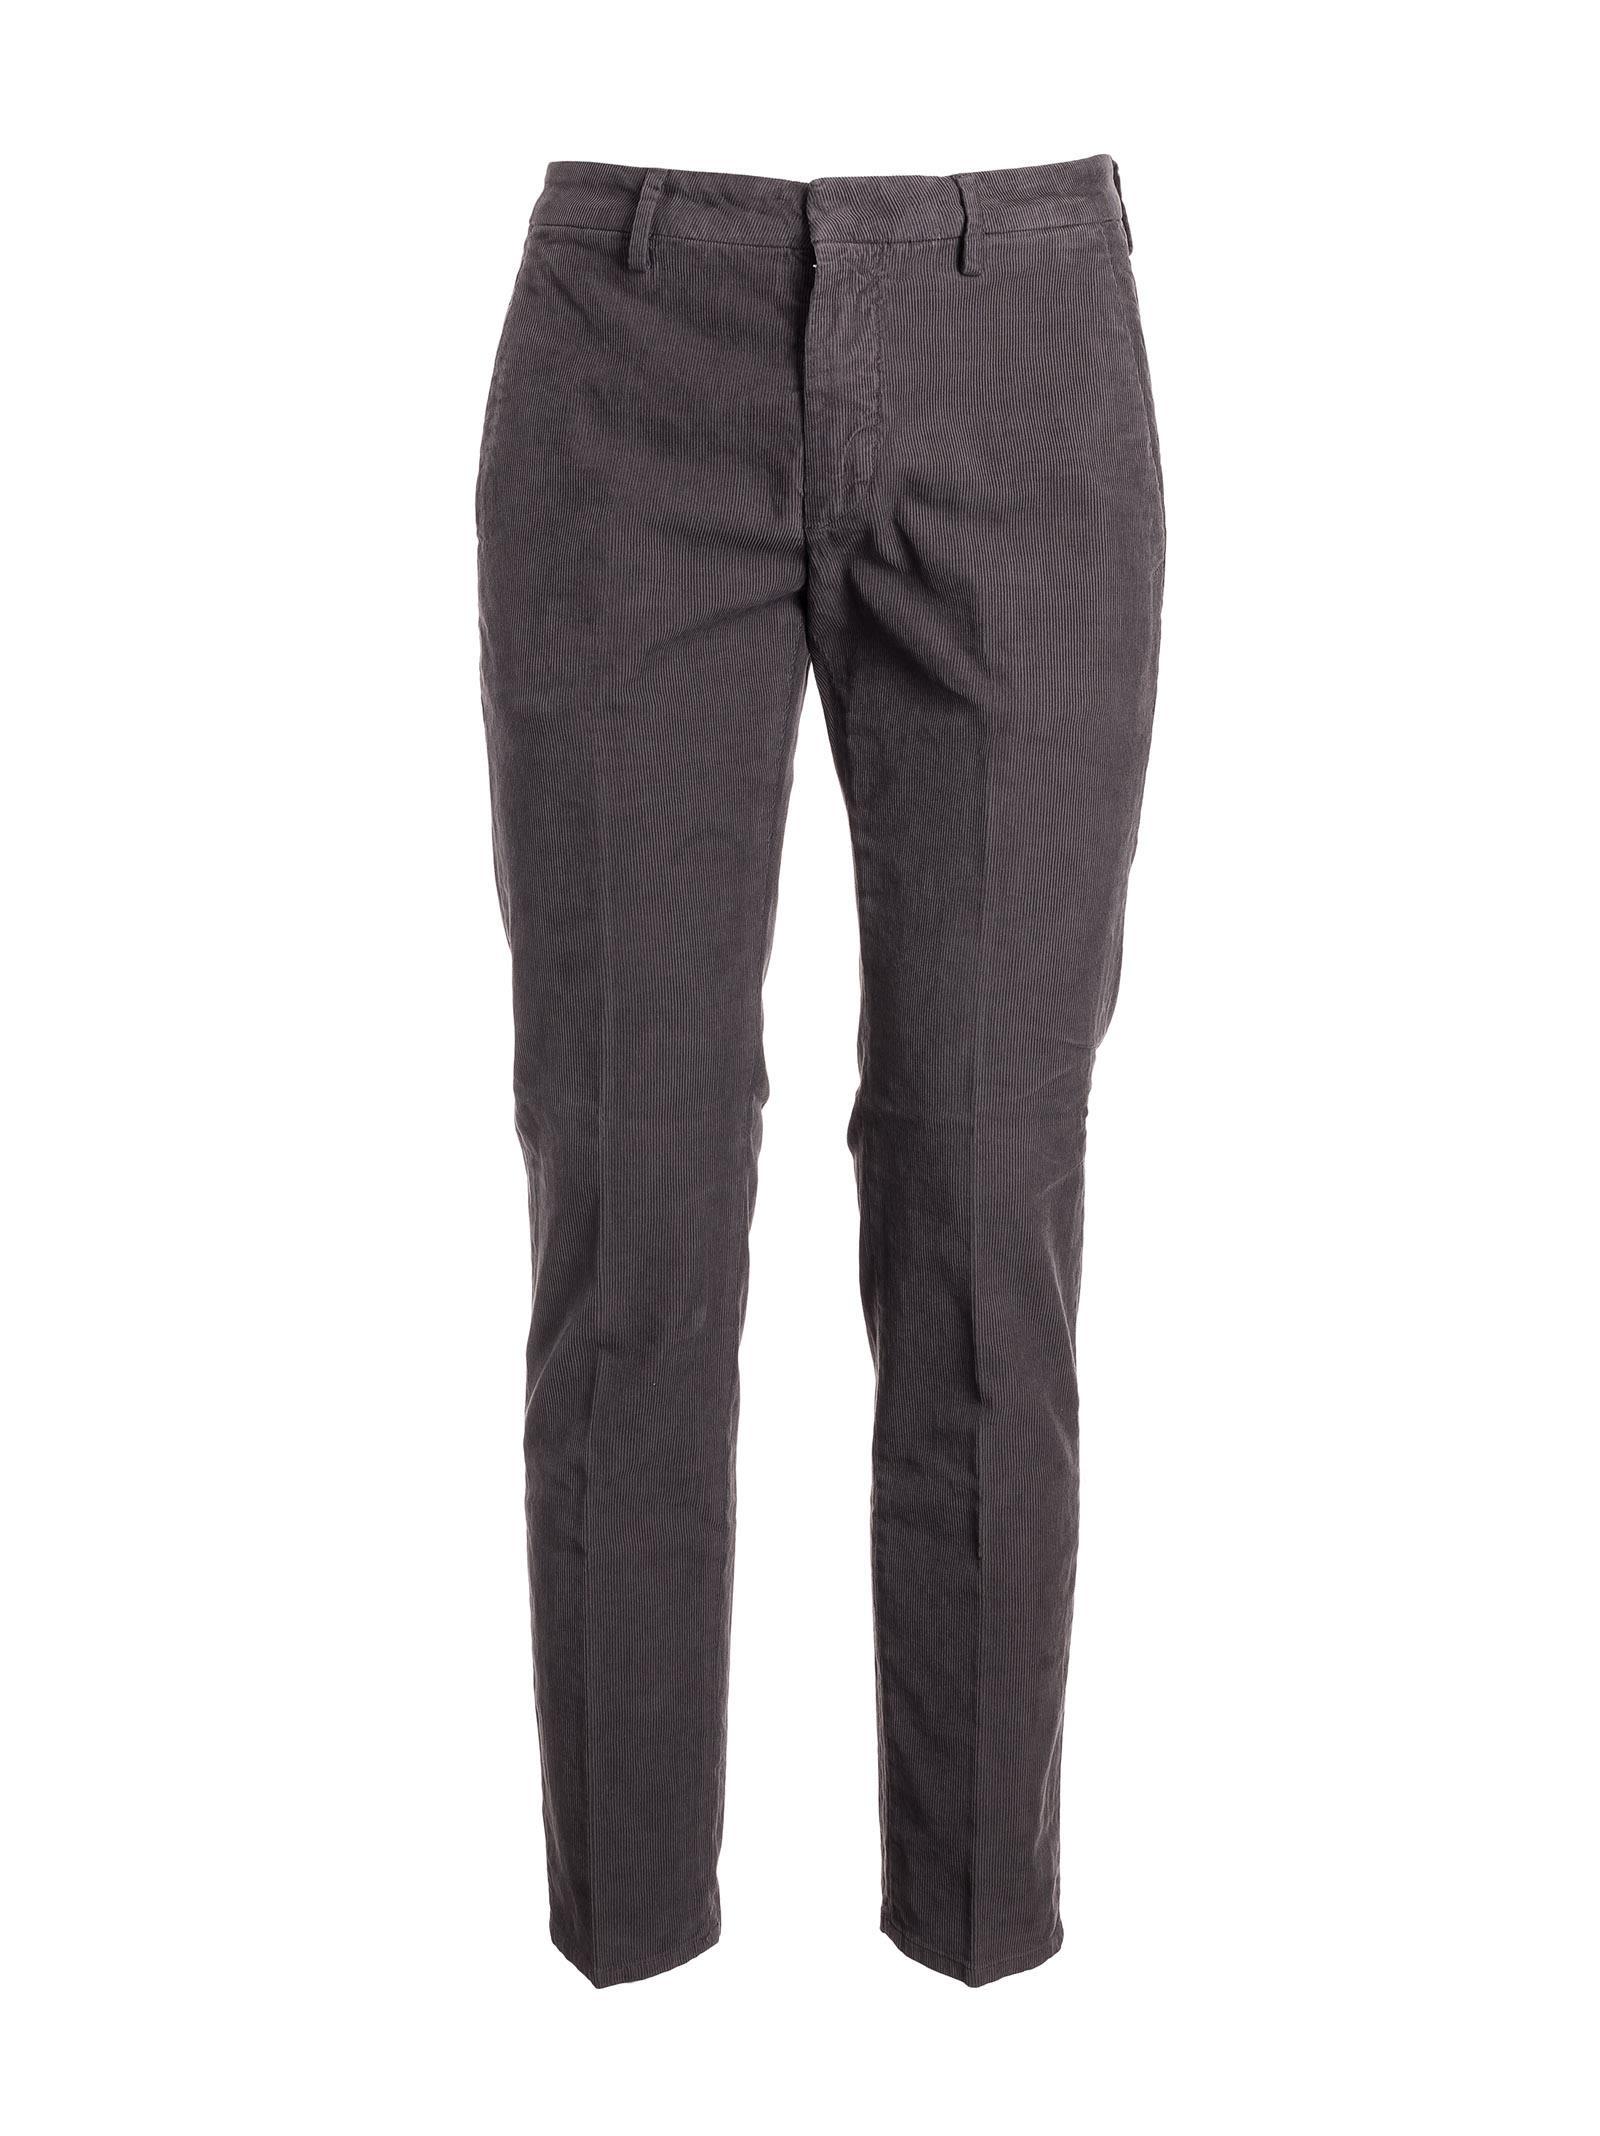 Dondup Corduroy Slim Fit Trousers